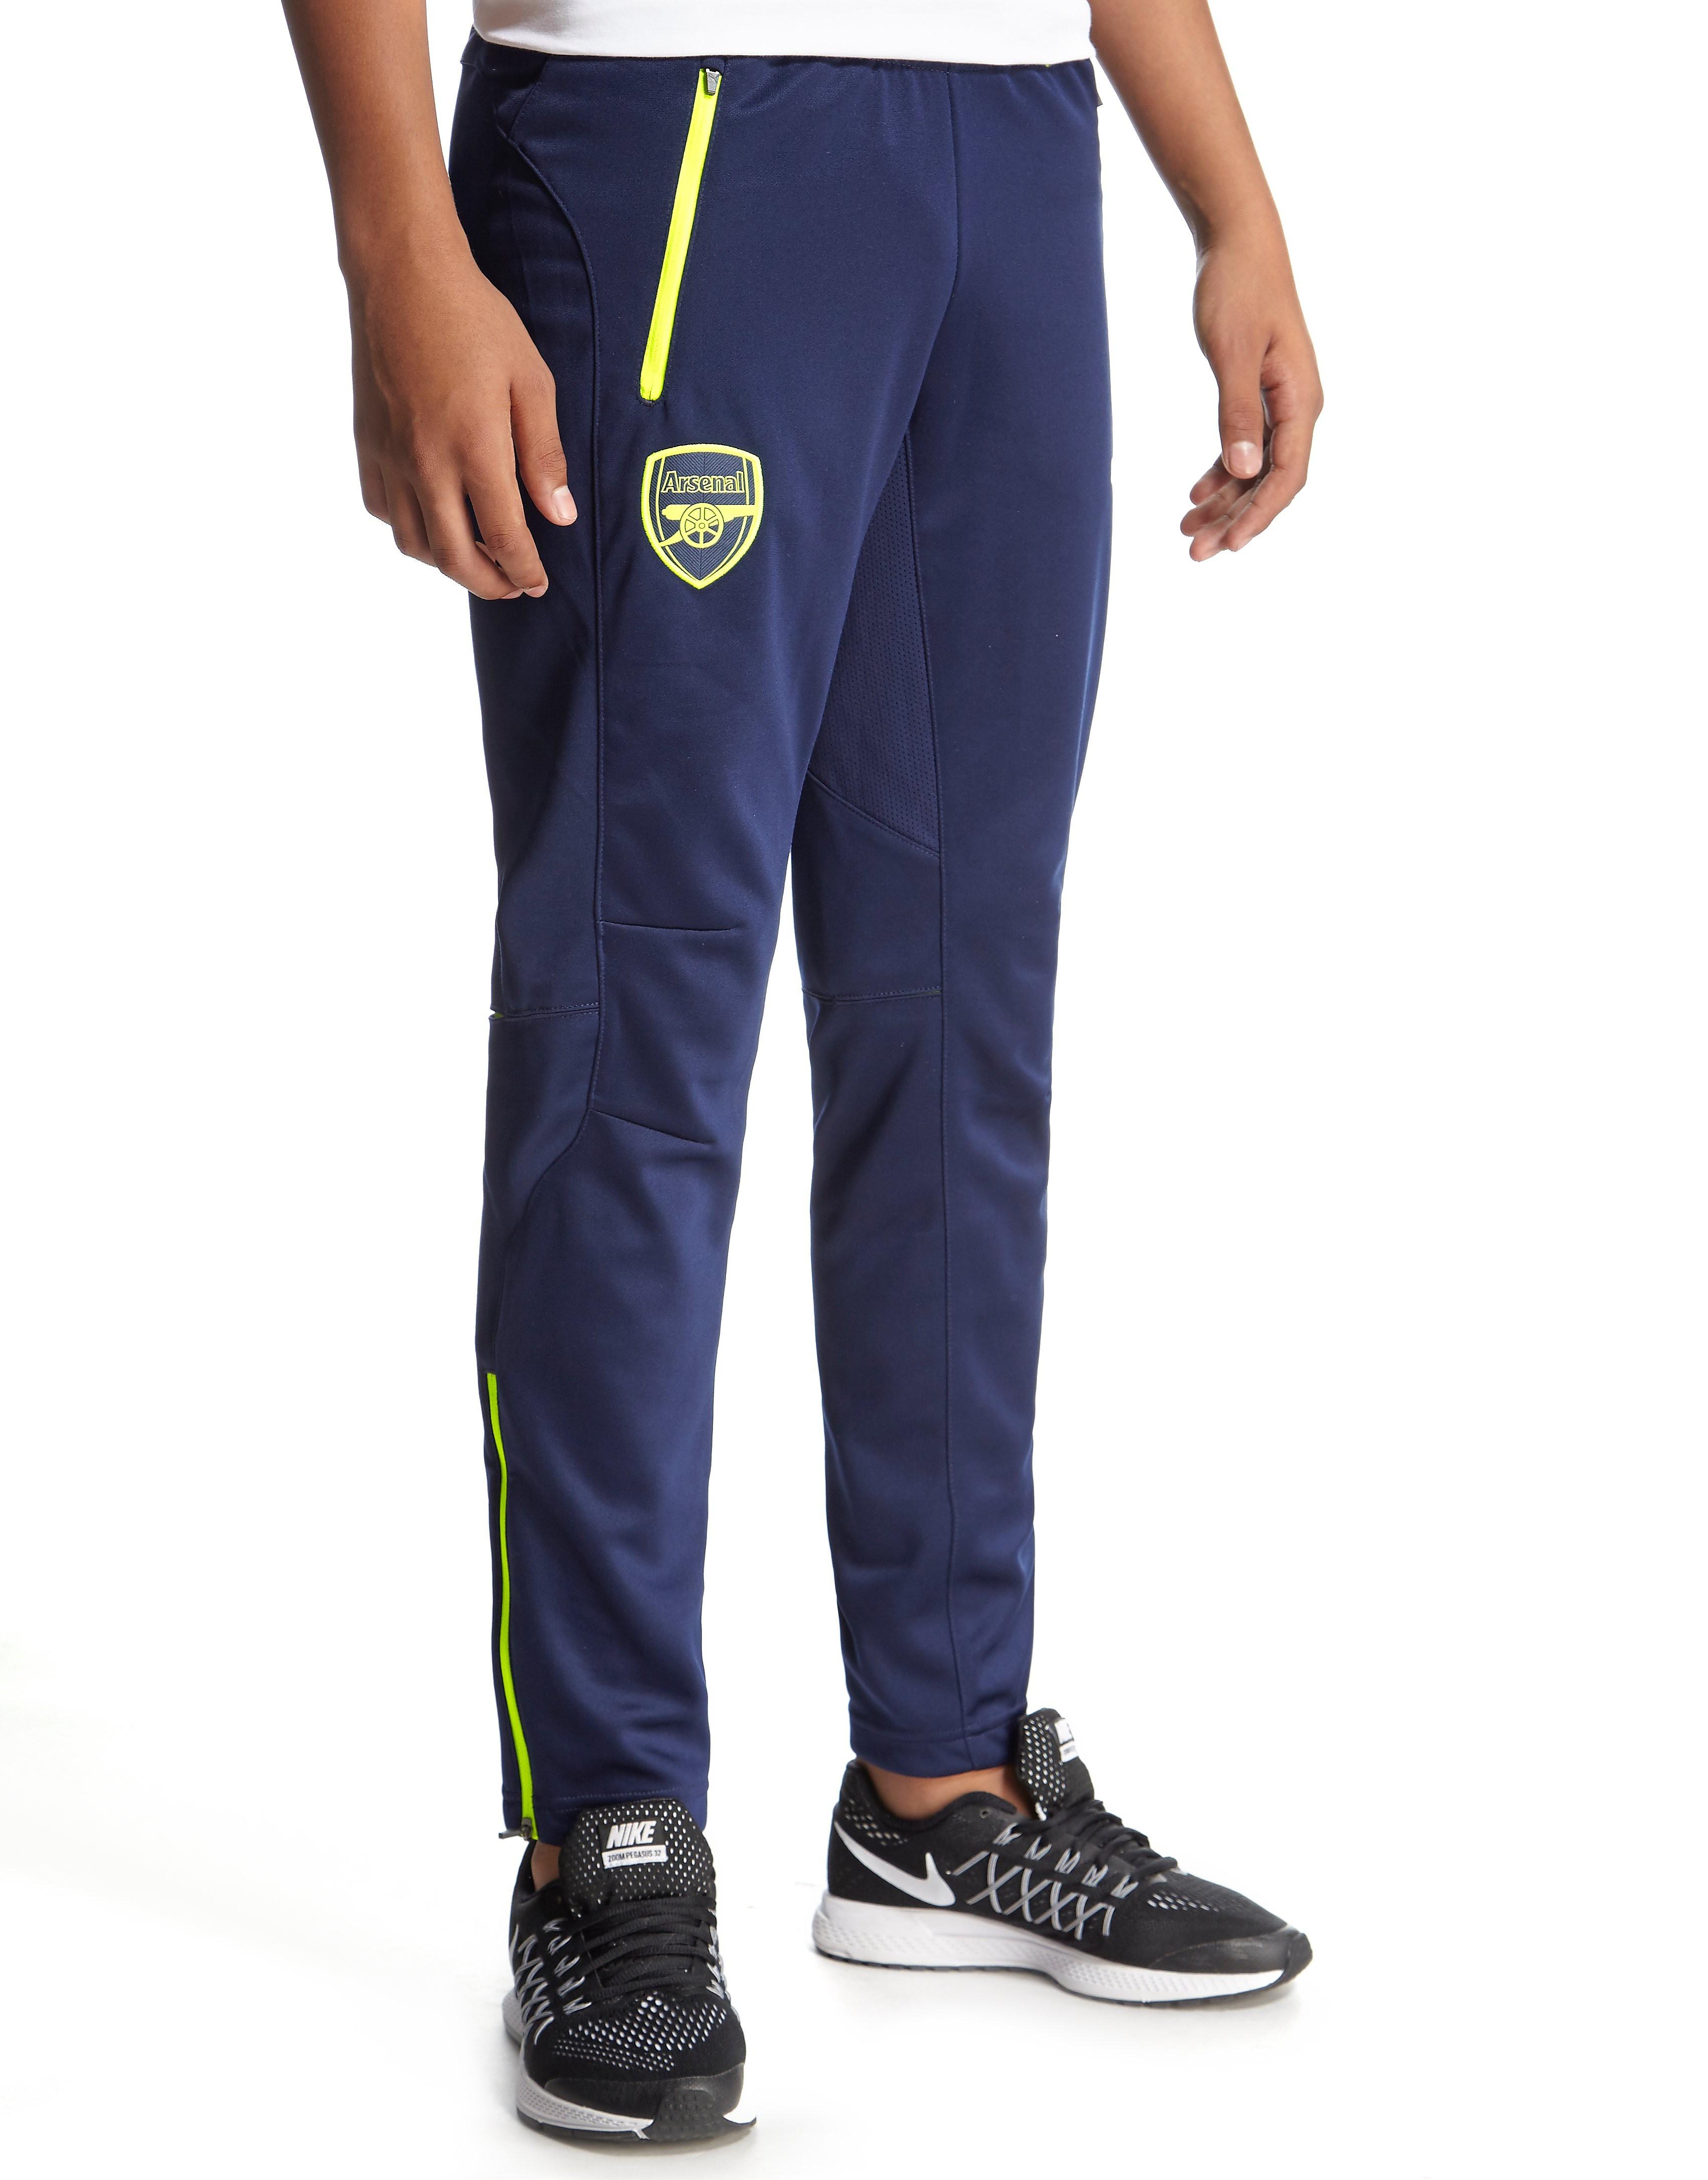 PUMA Arsenal FC 2017 Training Pants